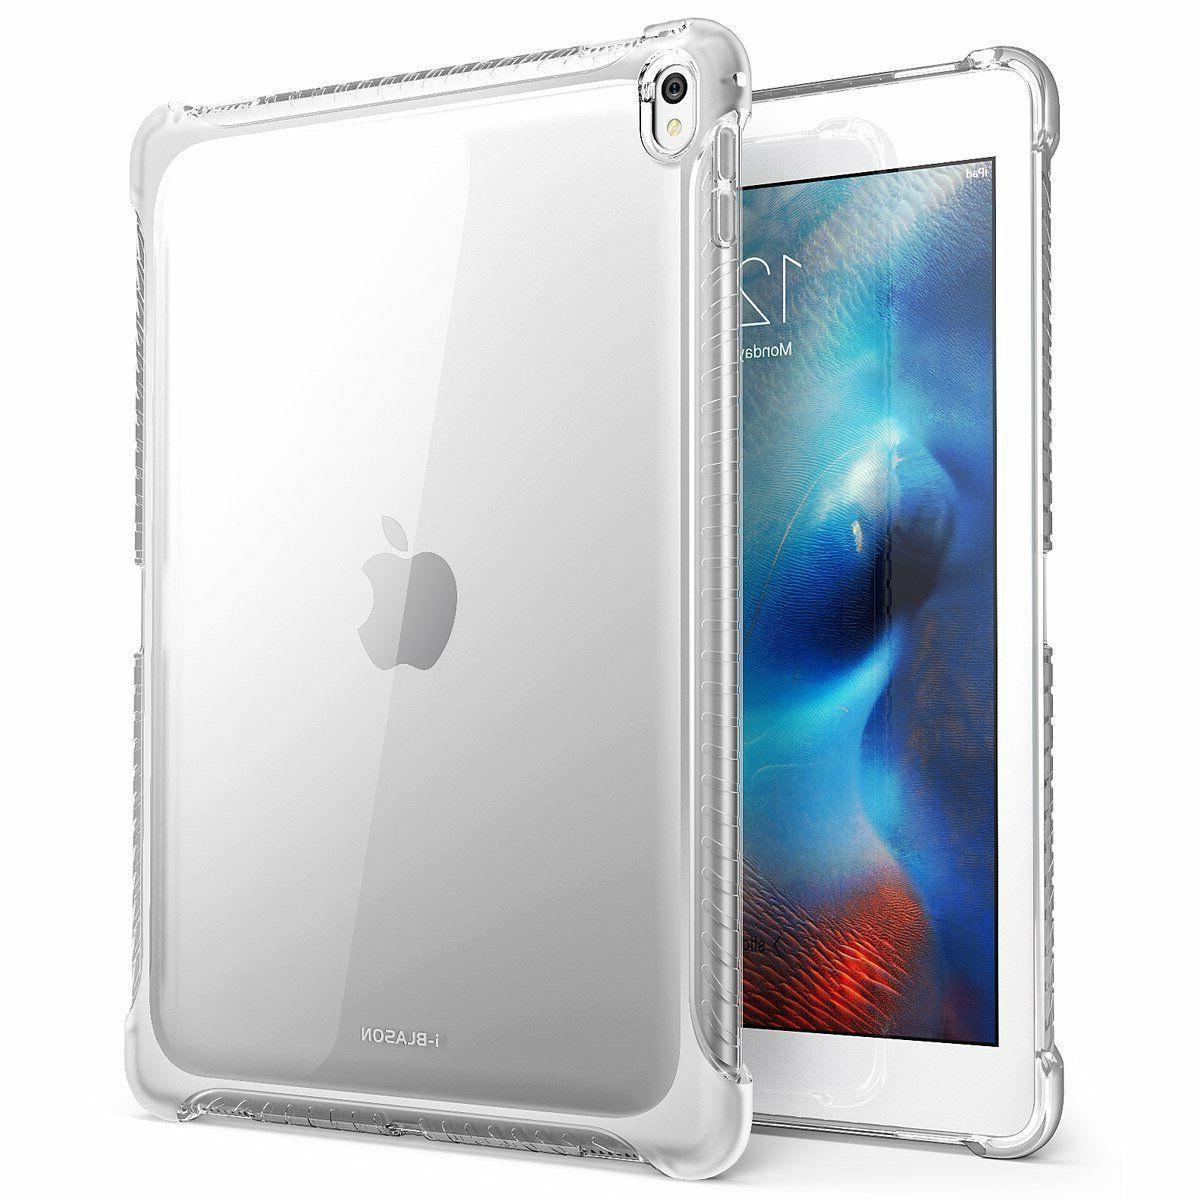 "For iPad 9.7"" Slim Profile Flexible Cover"